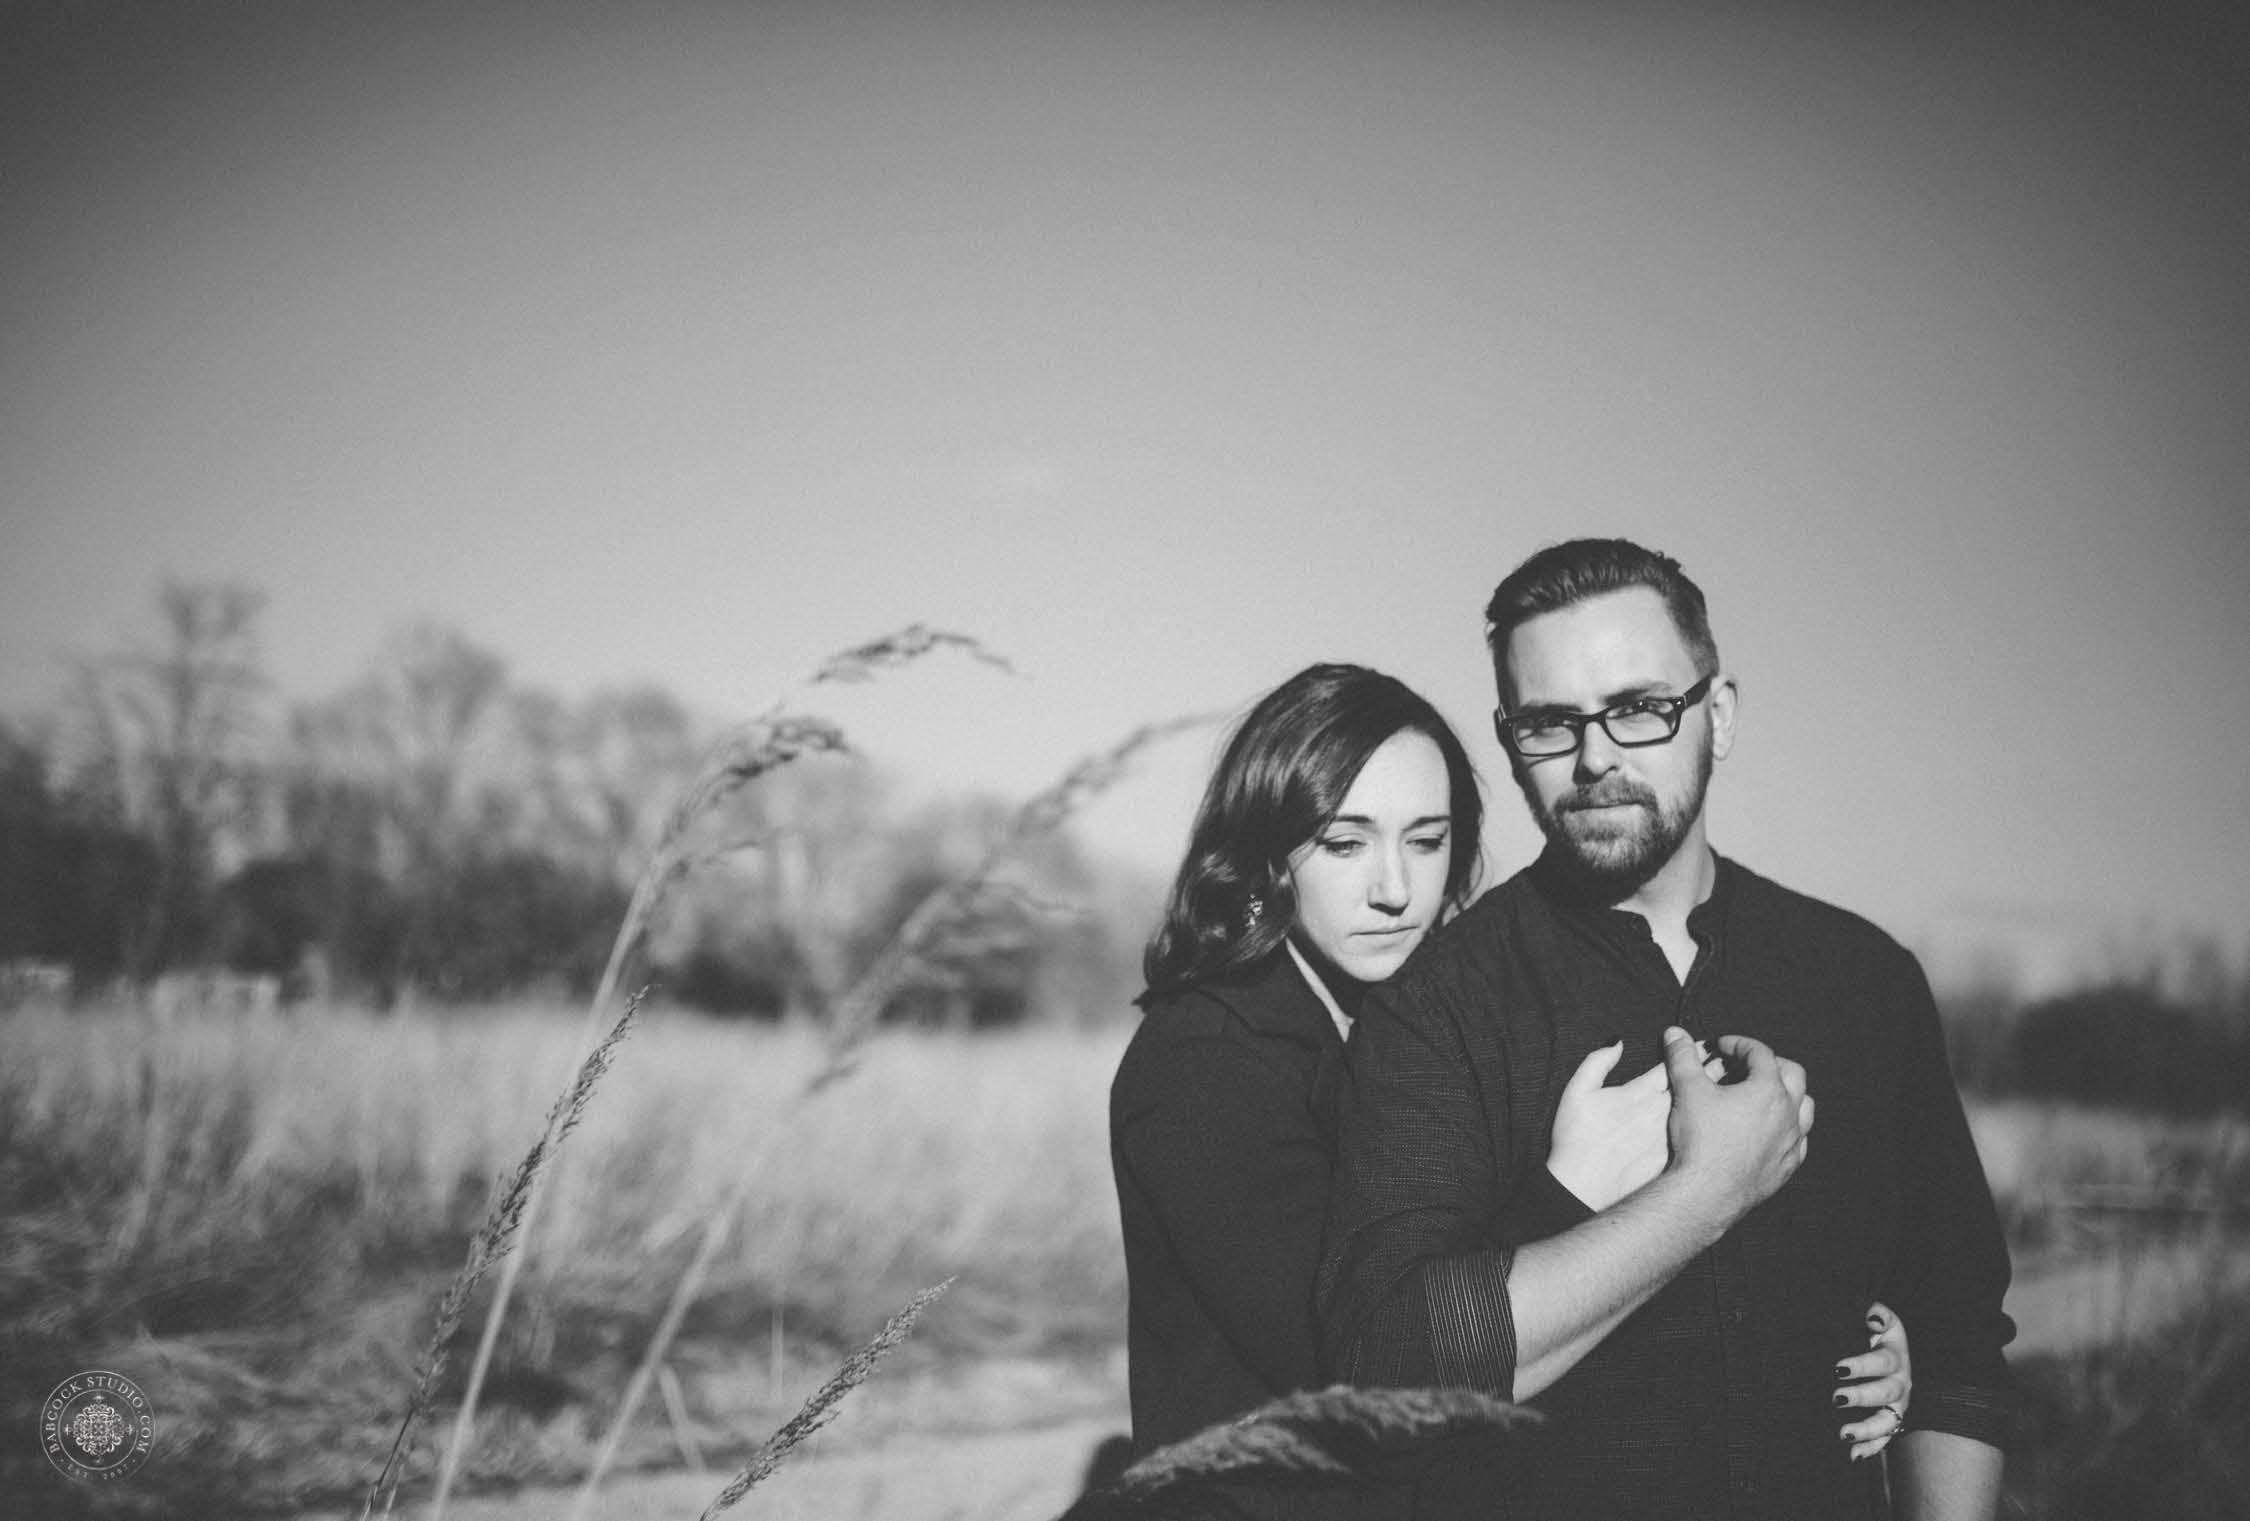 taylor-josh-engagement-photographer-dayton-ohio-9.jpg